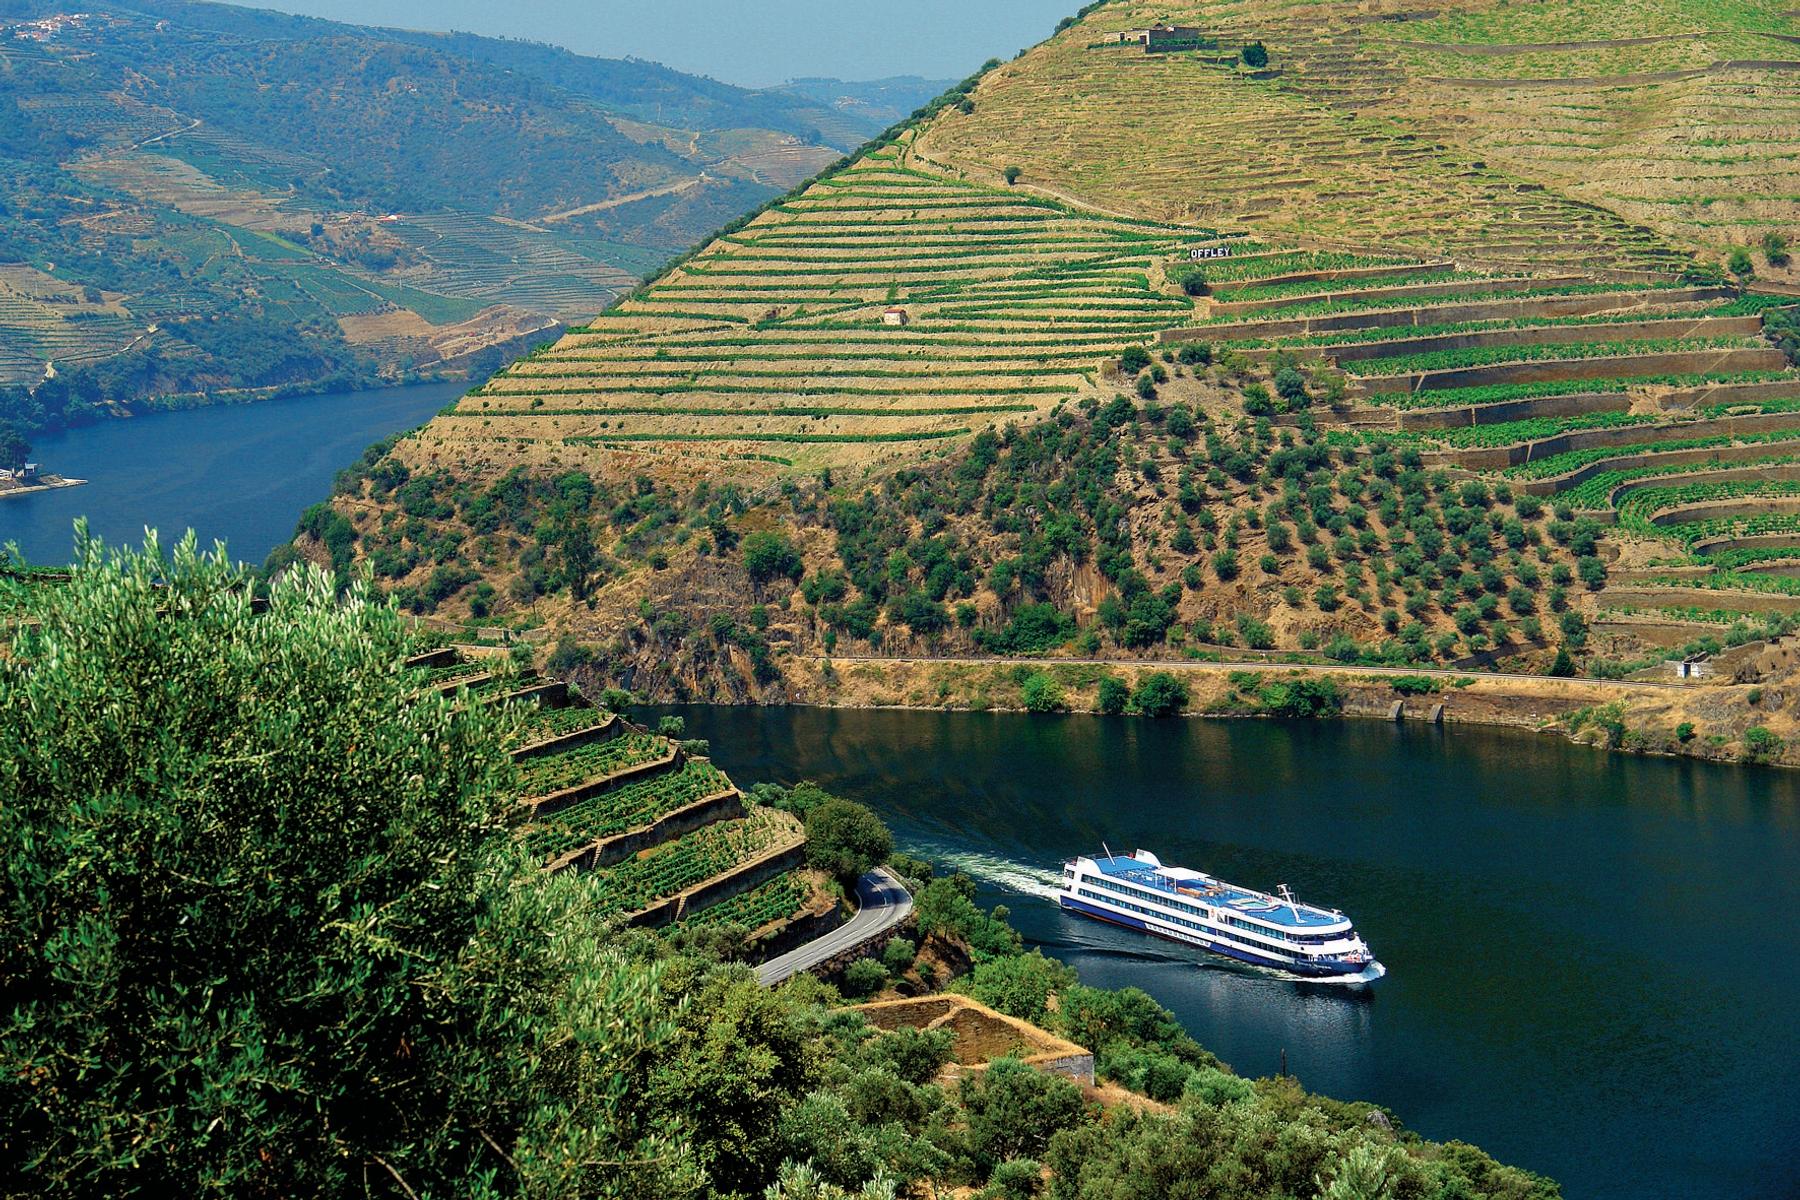 Douro Valley cruise